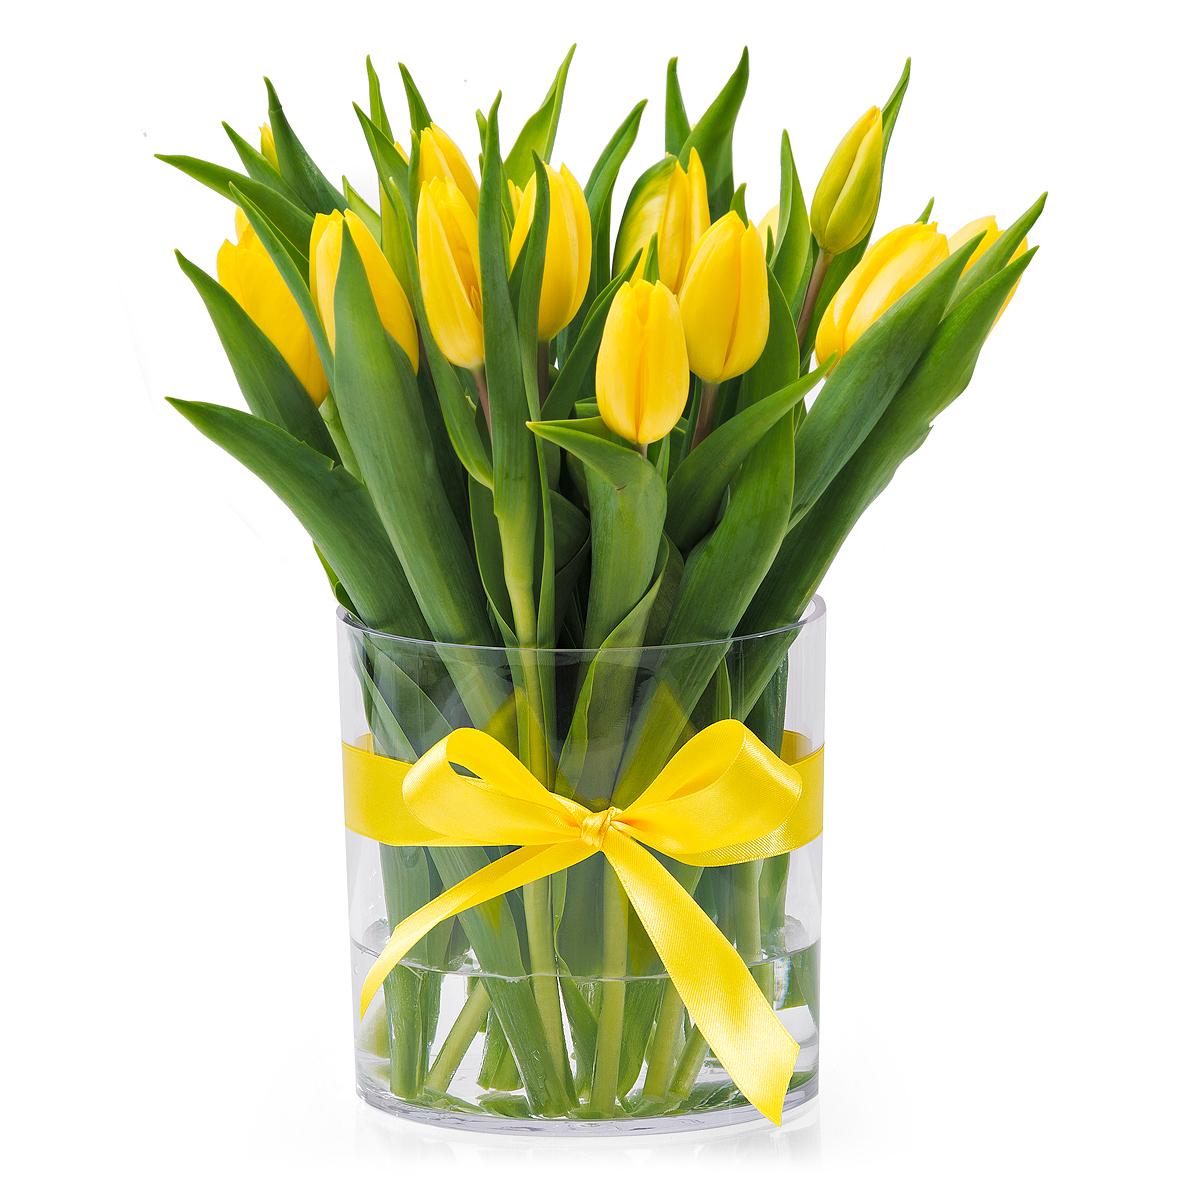 les tulipes jaunes dans une vase blanche cadofrance. Black Bedroom Furniture Sets. Home Design Ideas